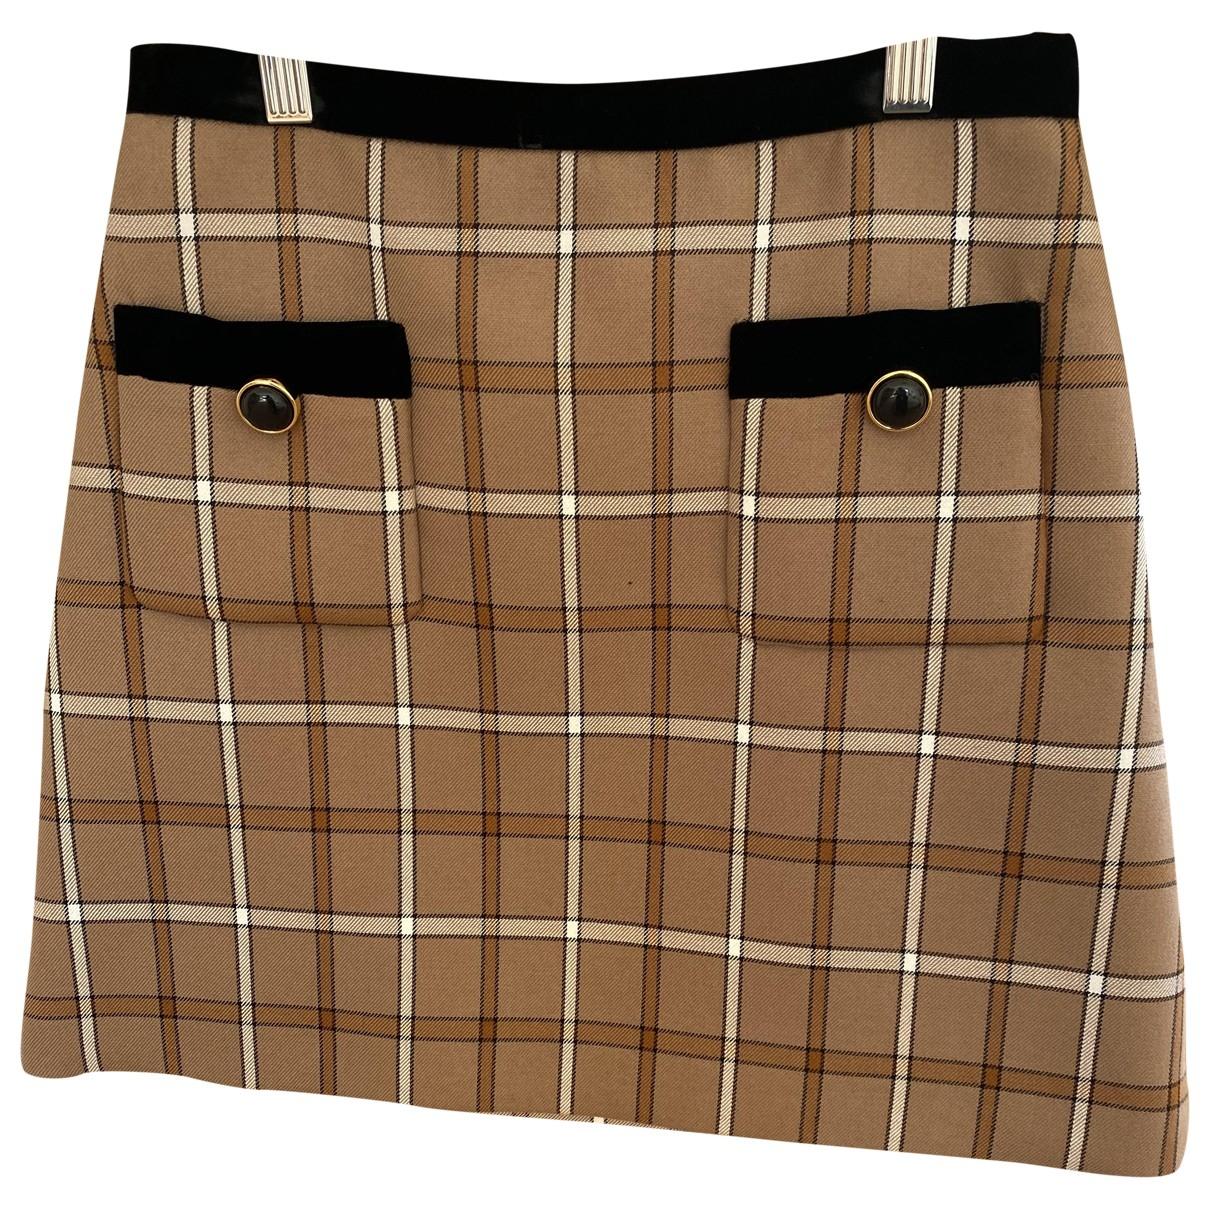 Miu Miu \N Camel skirt for Women 38 IT